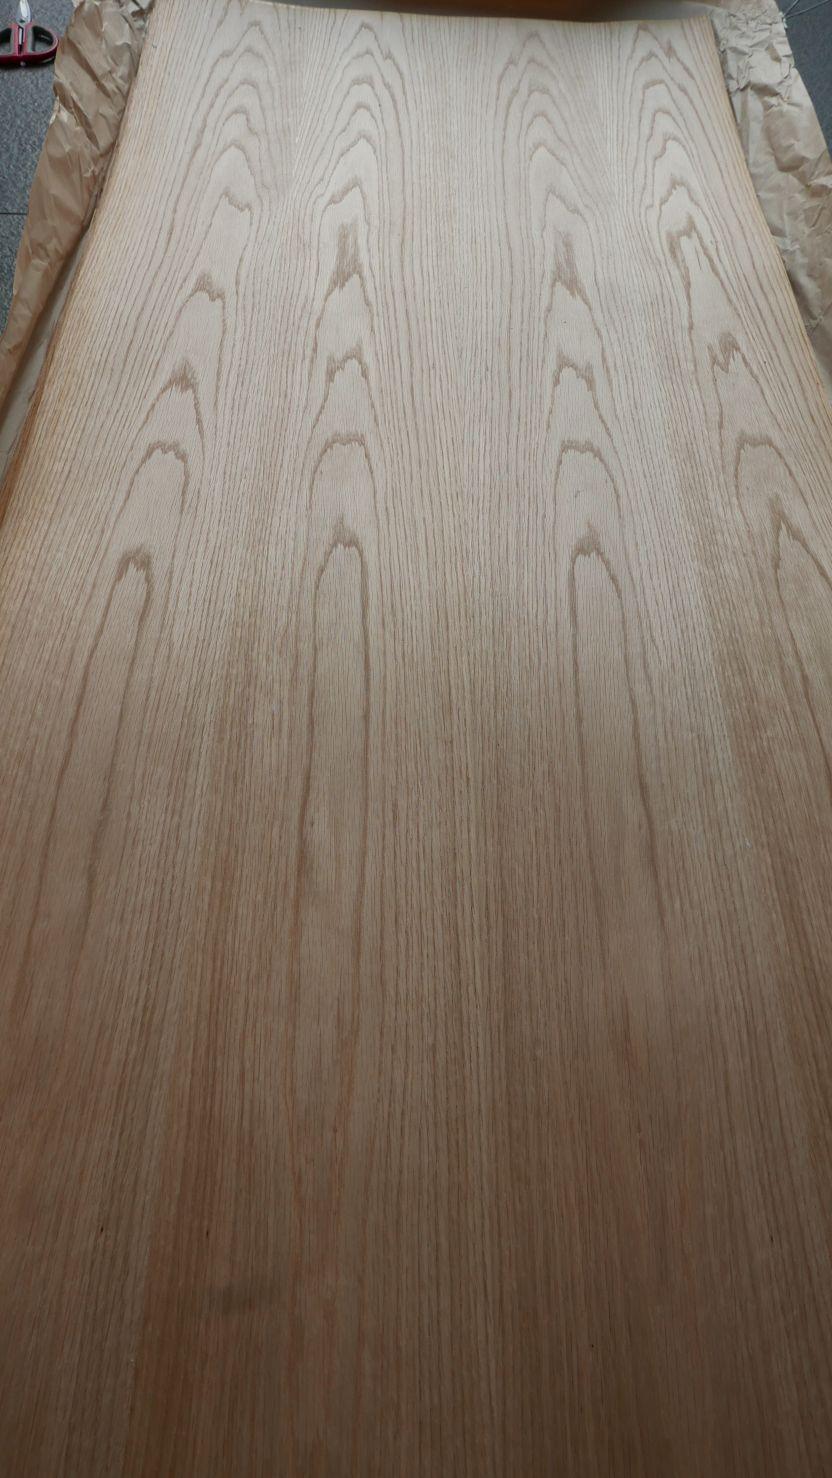 A0256-9 Europees Eiken Gevoegd 74x201cm